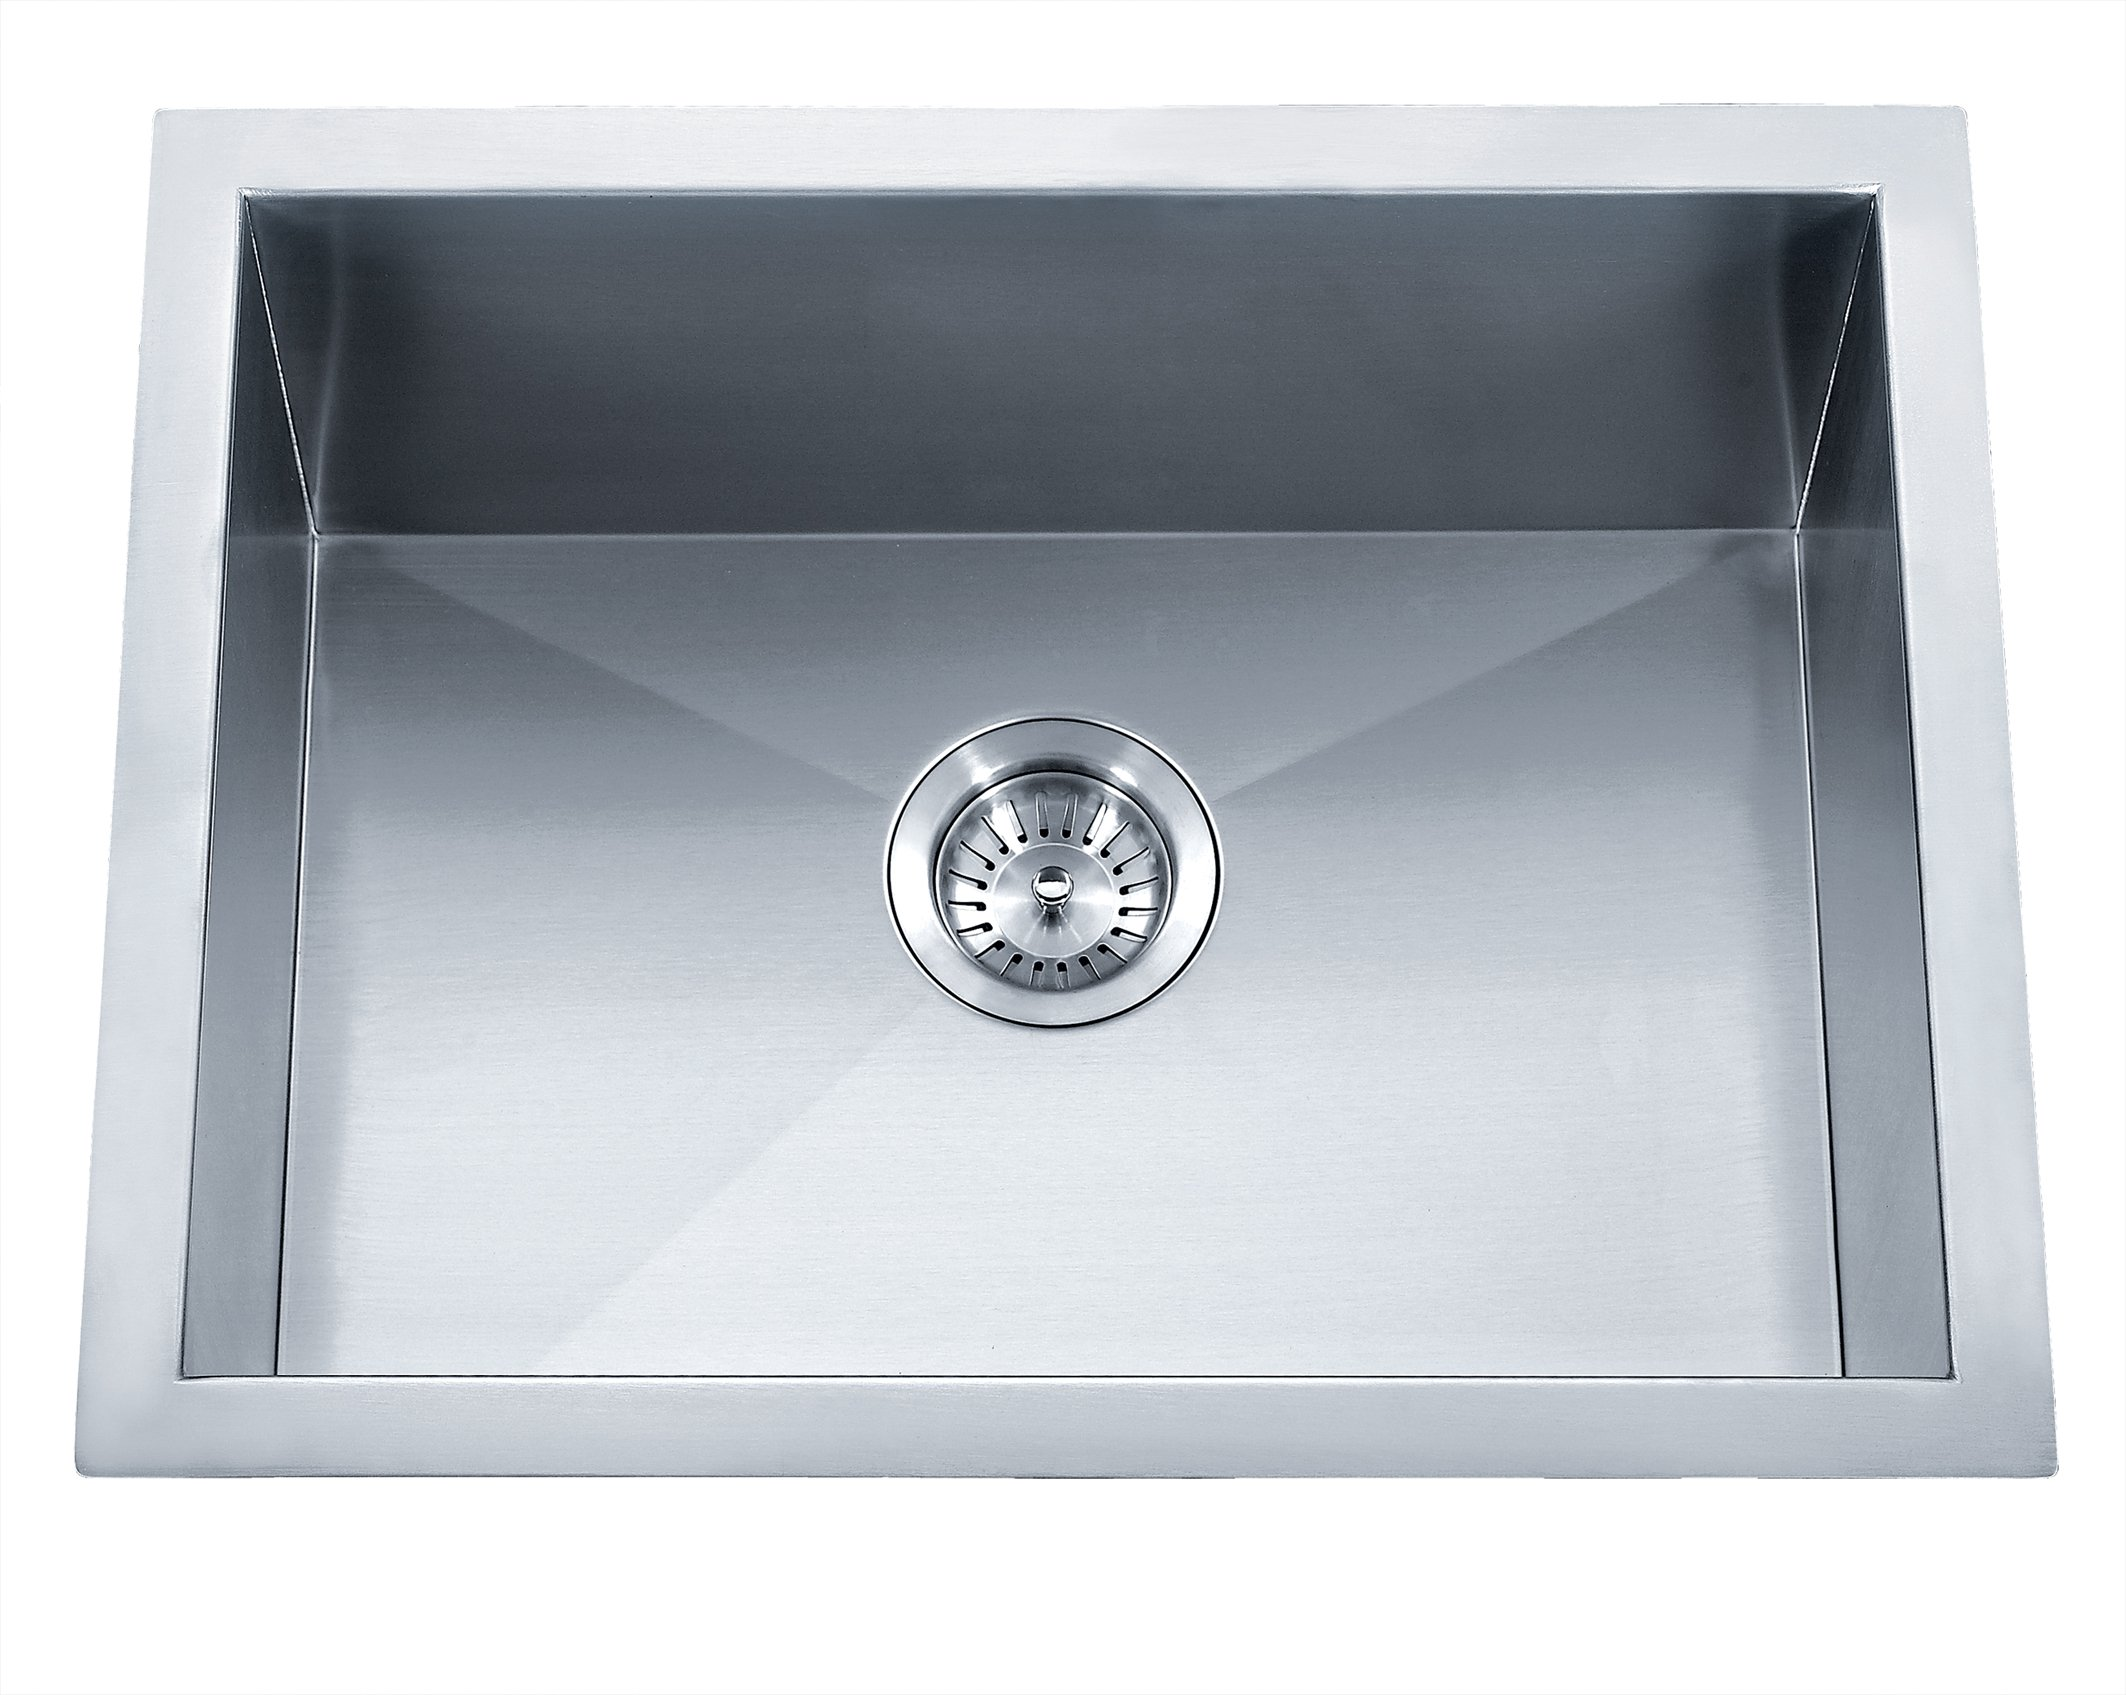 Undermount Kitchen Sink: Amazon.ca